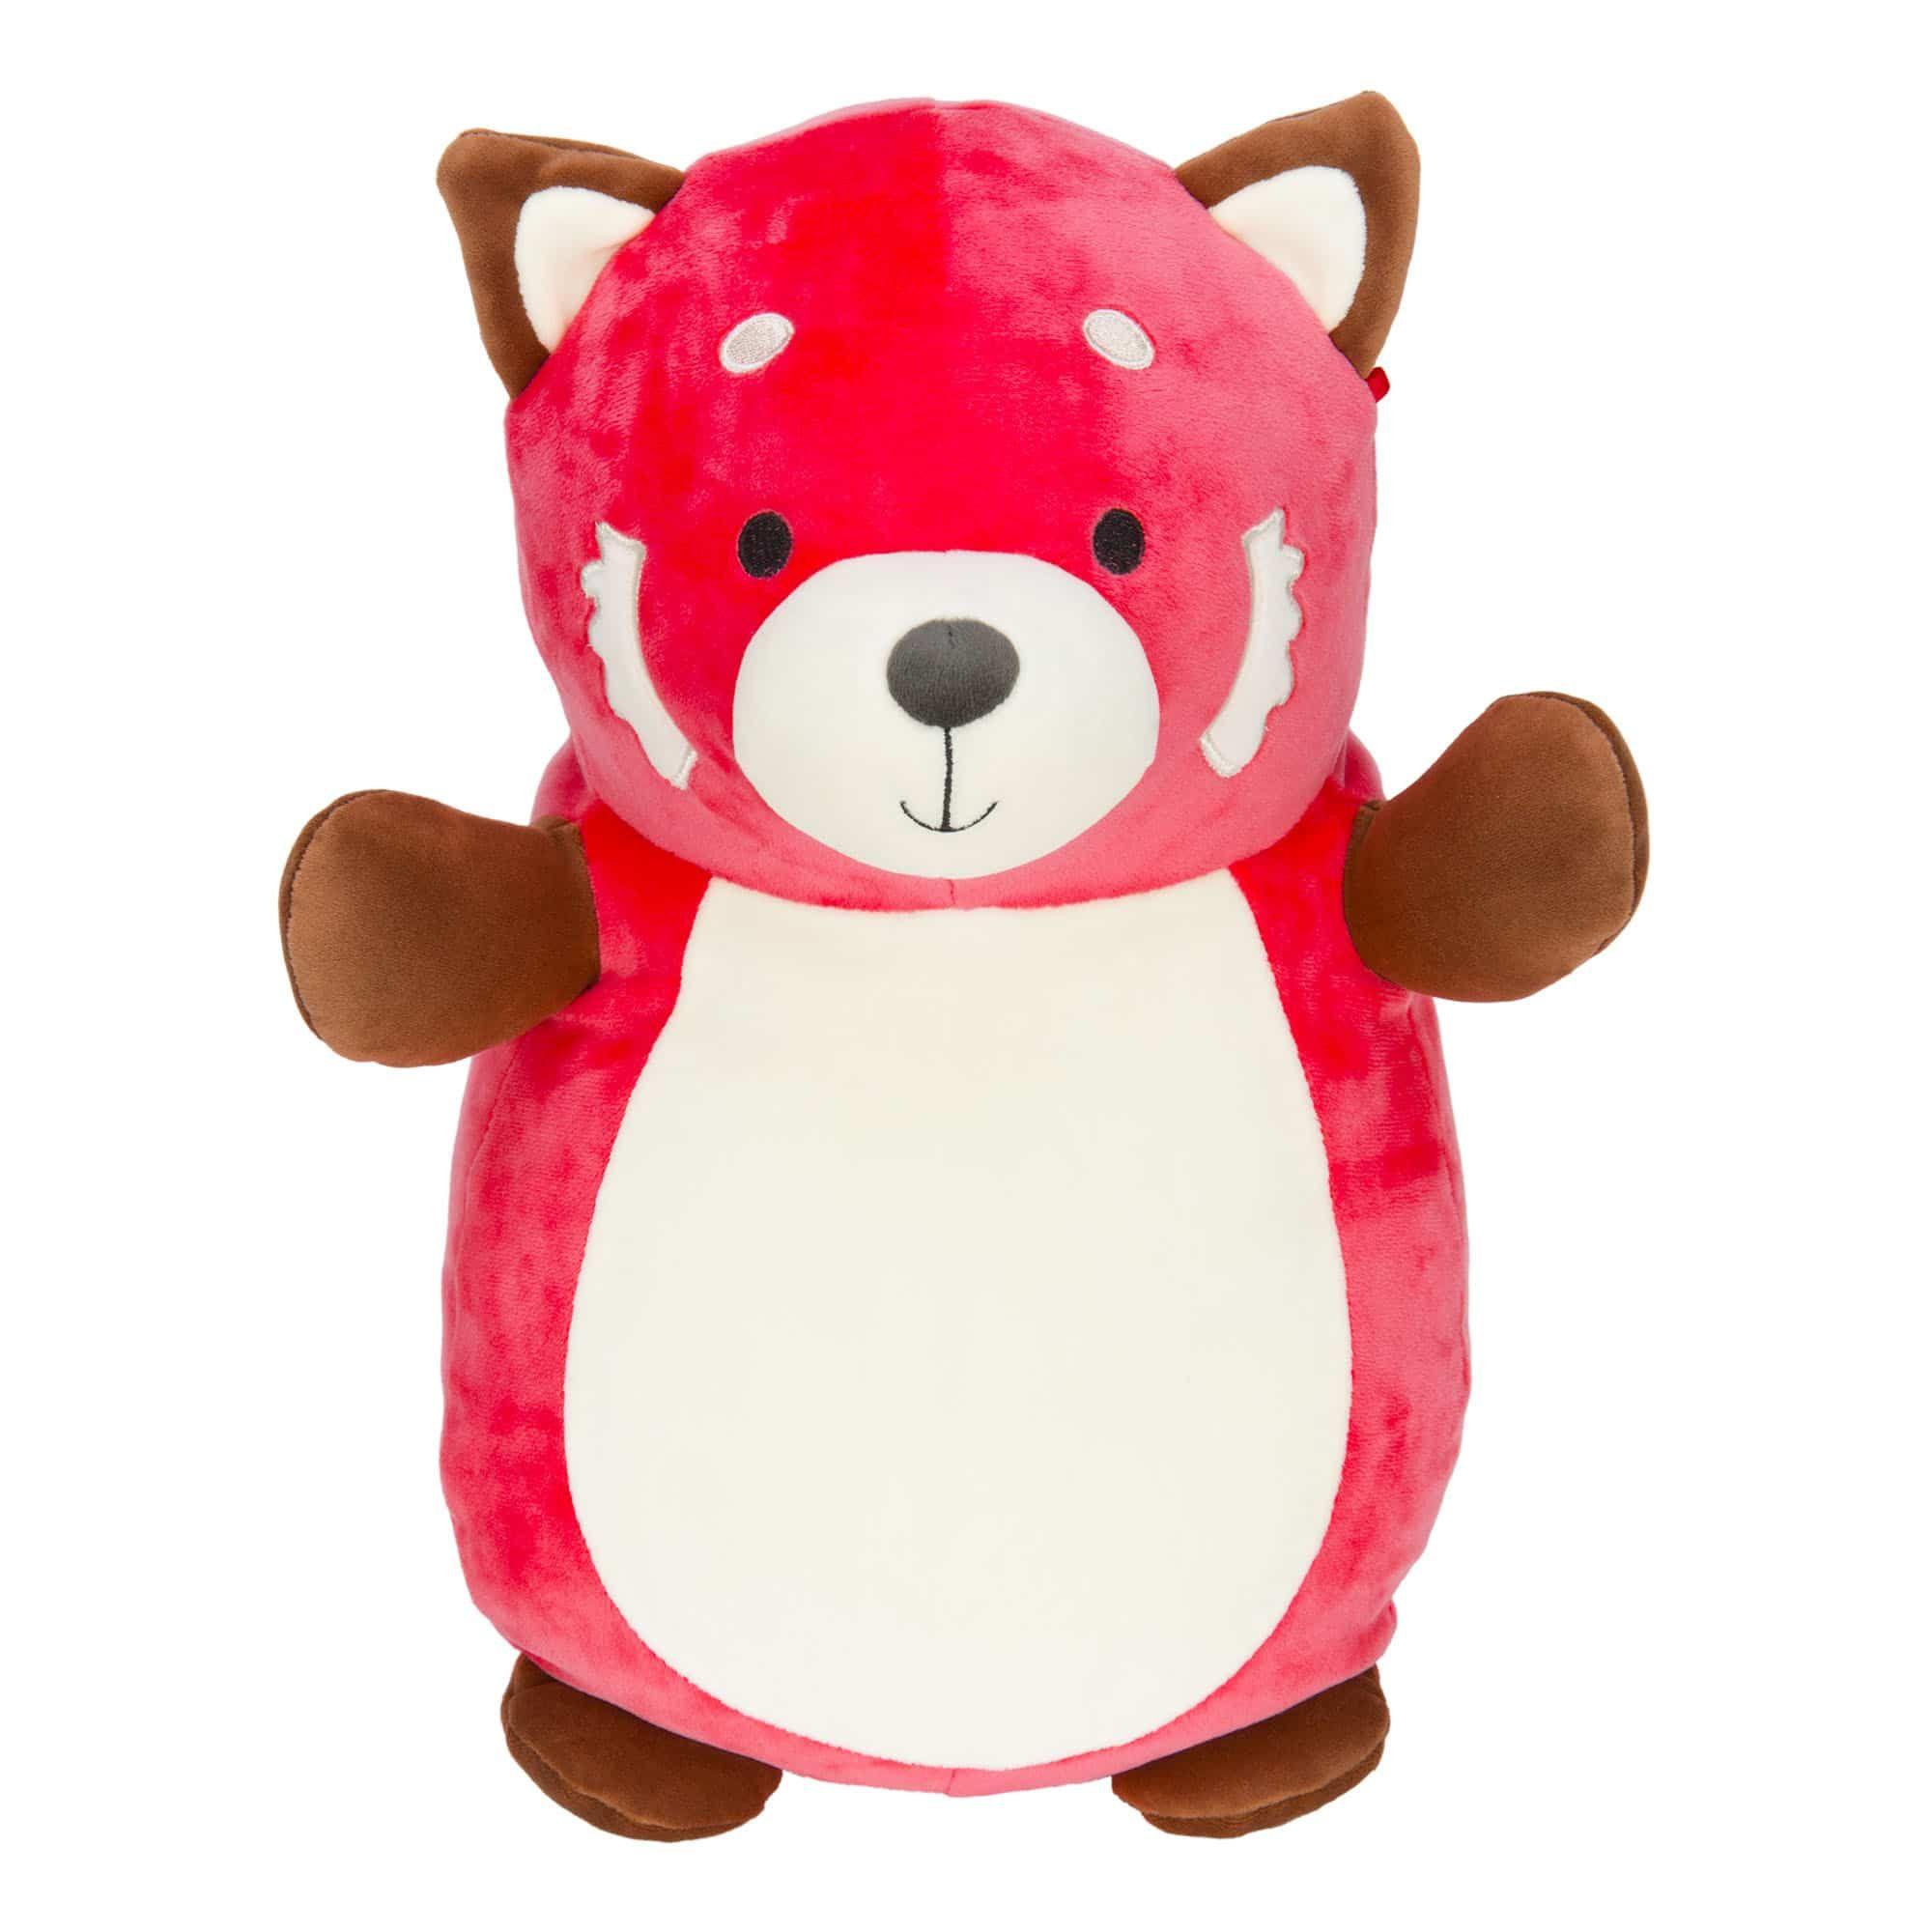 Super Soft Plush Toys Squishmallows Panda Hug Red Panda Cute Stuffed Animals